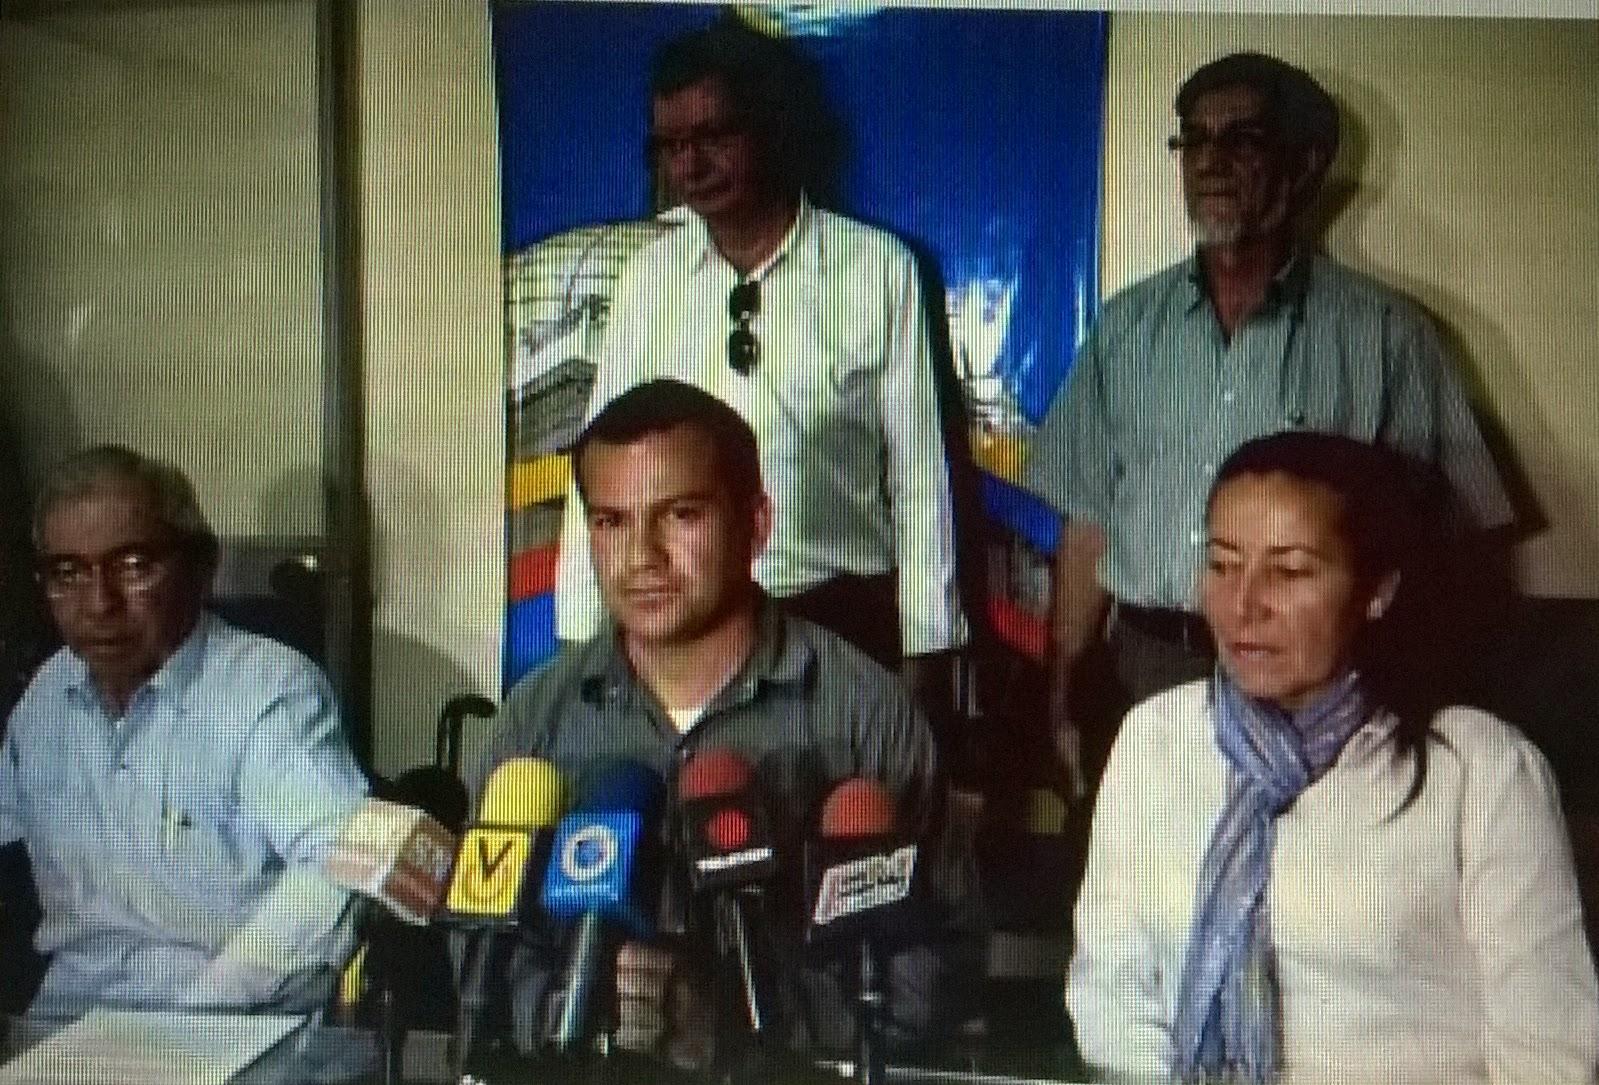 Apagón en Junín-Táchira genera pérdidas -solo el día sábado- por 800 millones de bolívares